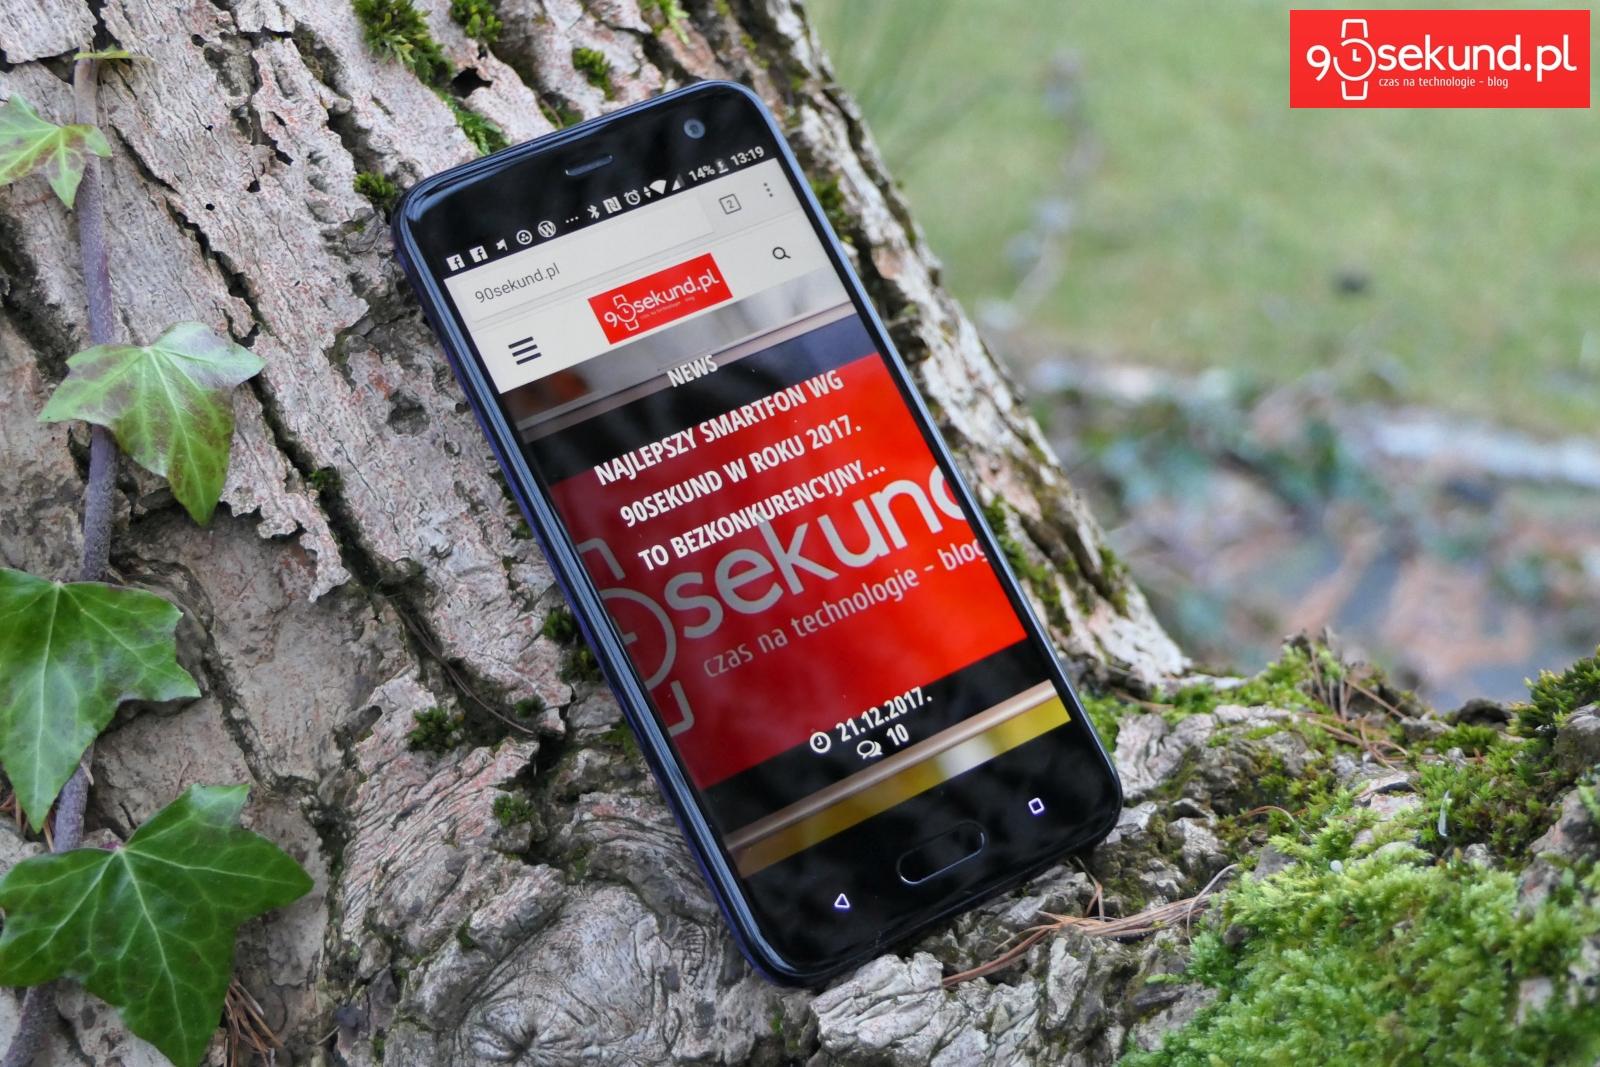 Recenzja HTC U11 life - 90sekund.pl